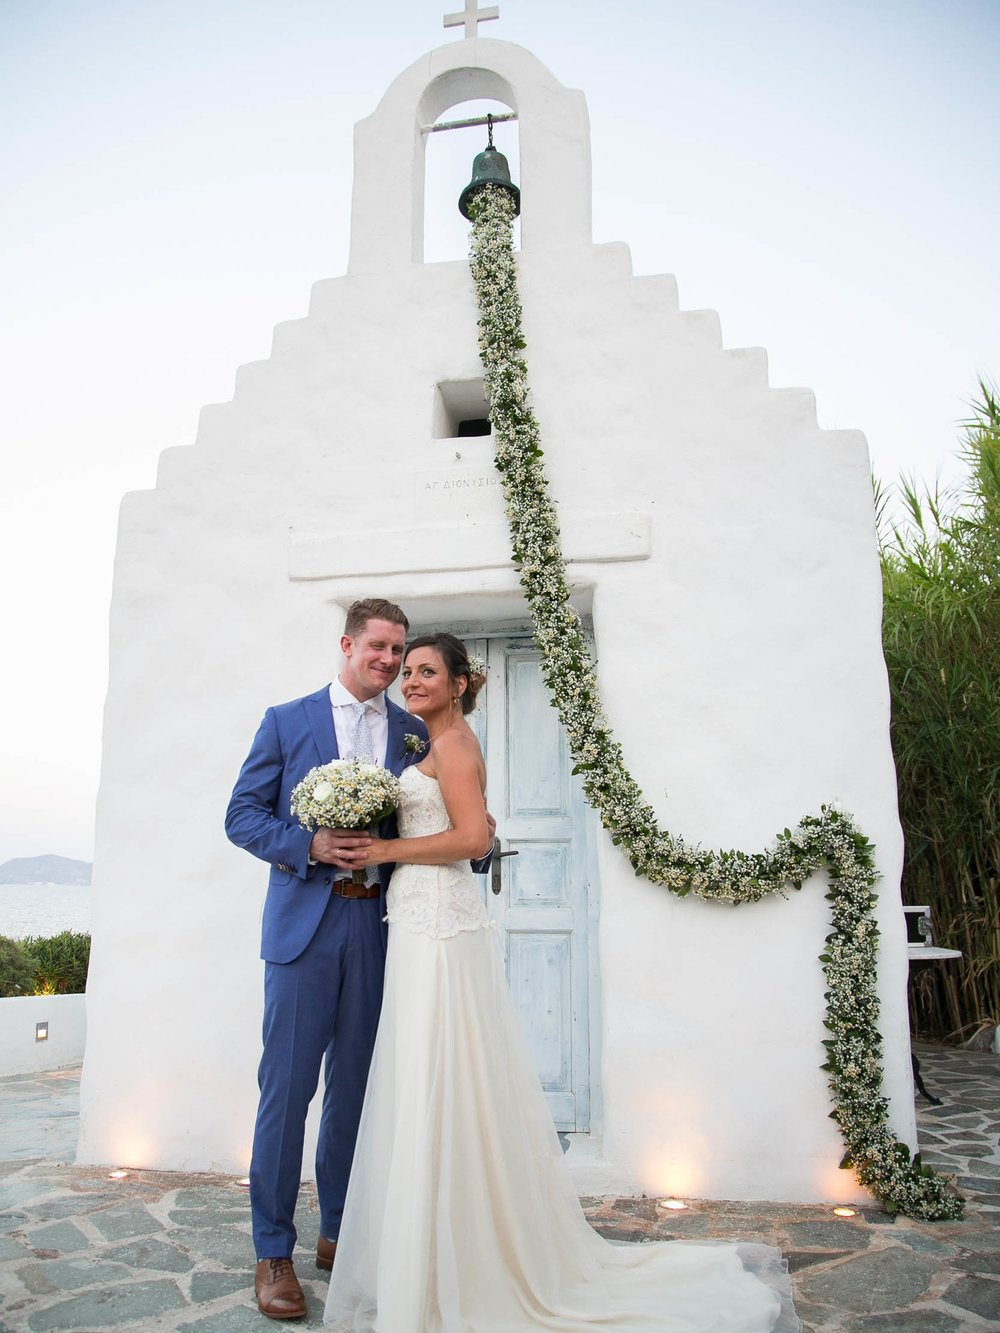 MARIANNA & ADAM - Γάμος με όμορφη θέα στο Island